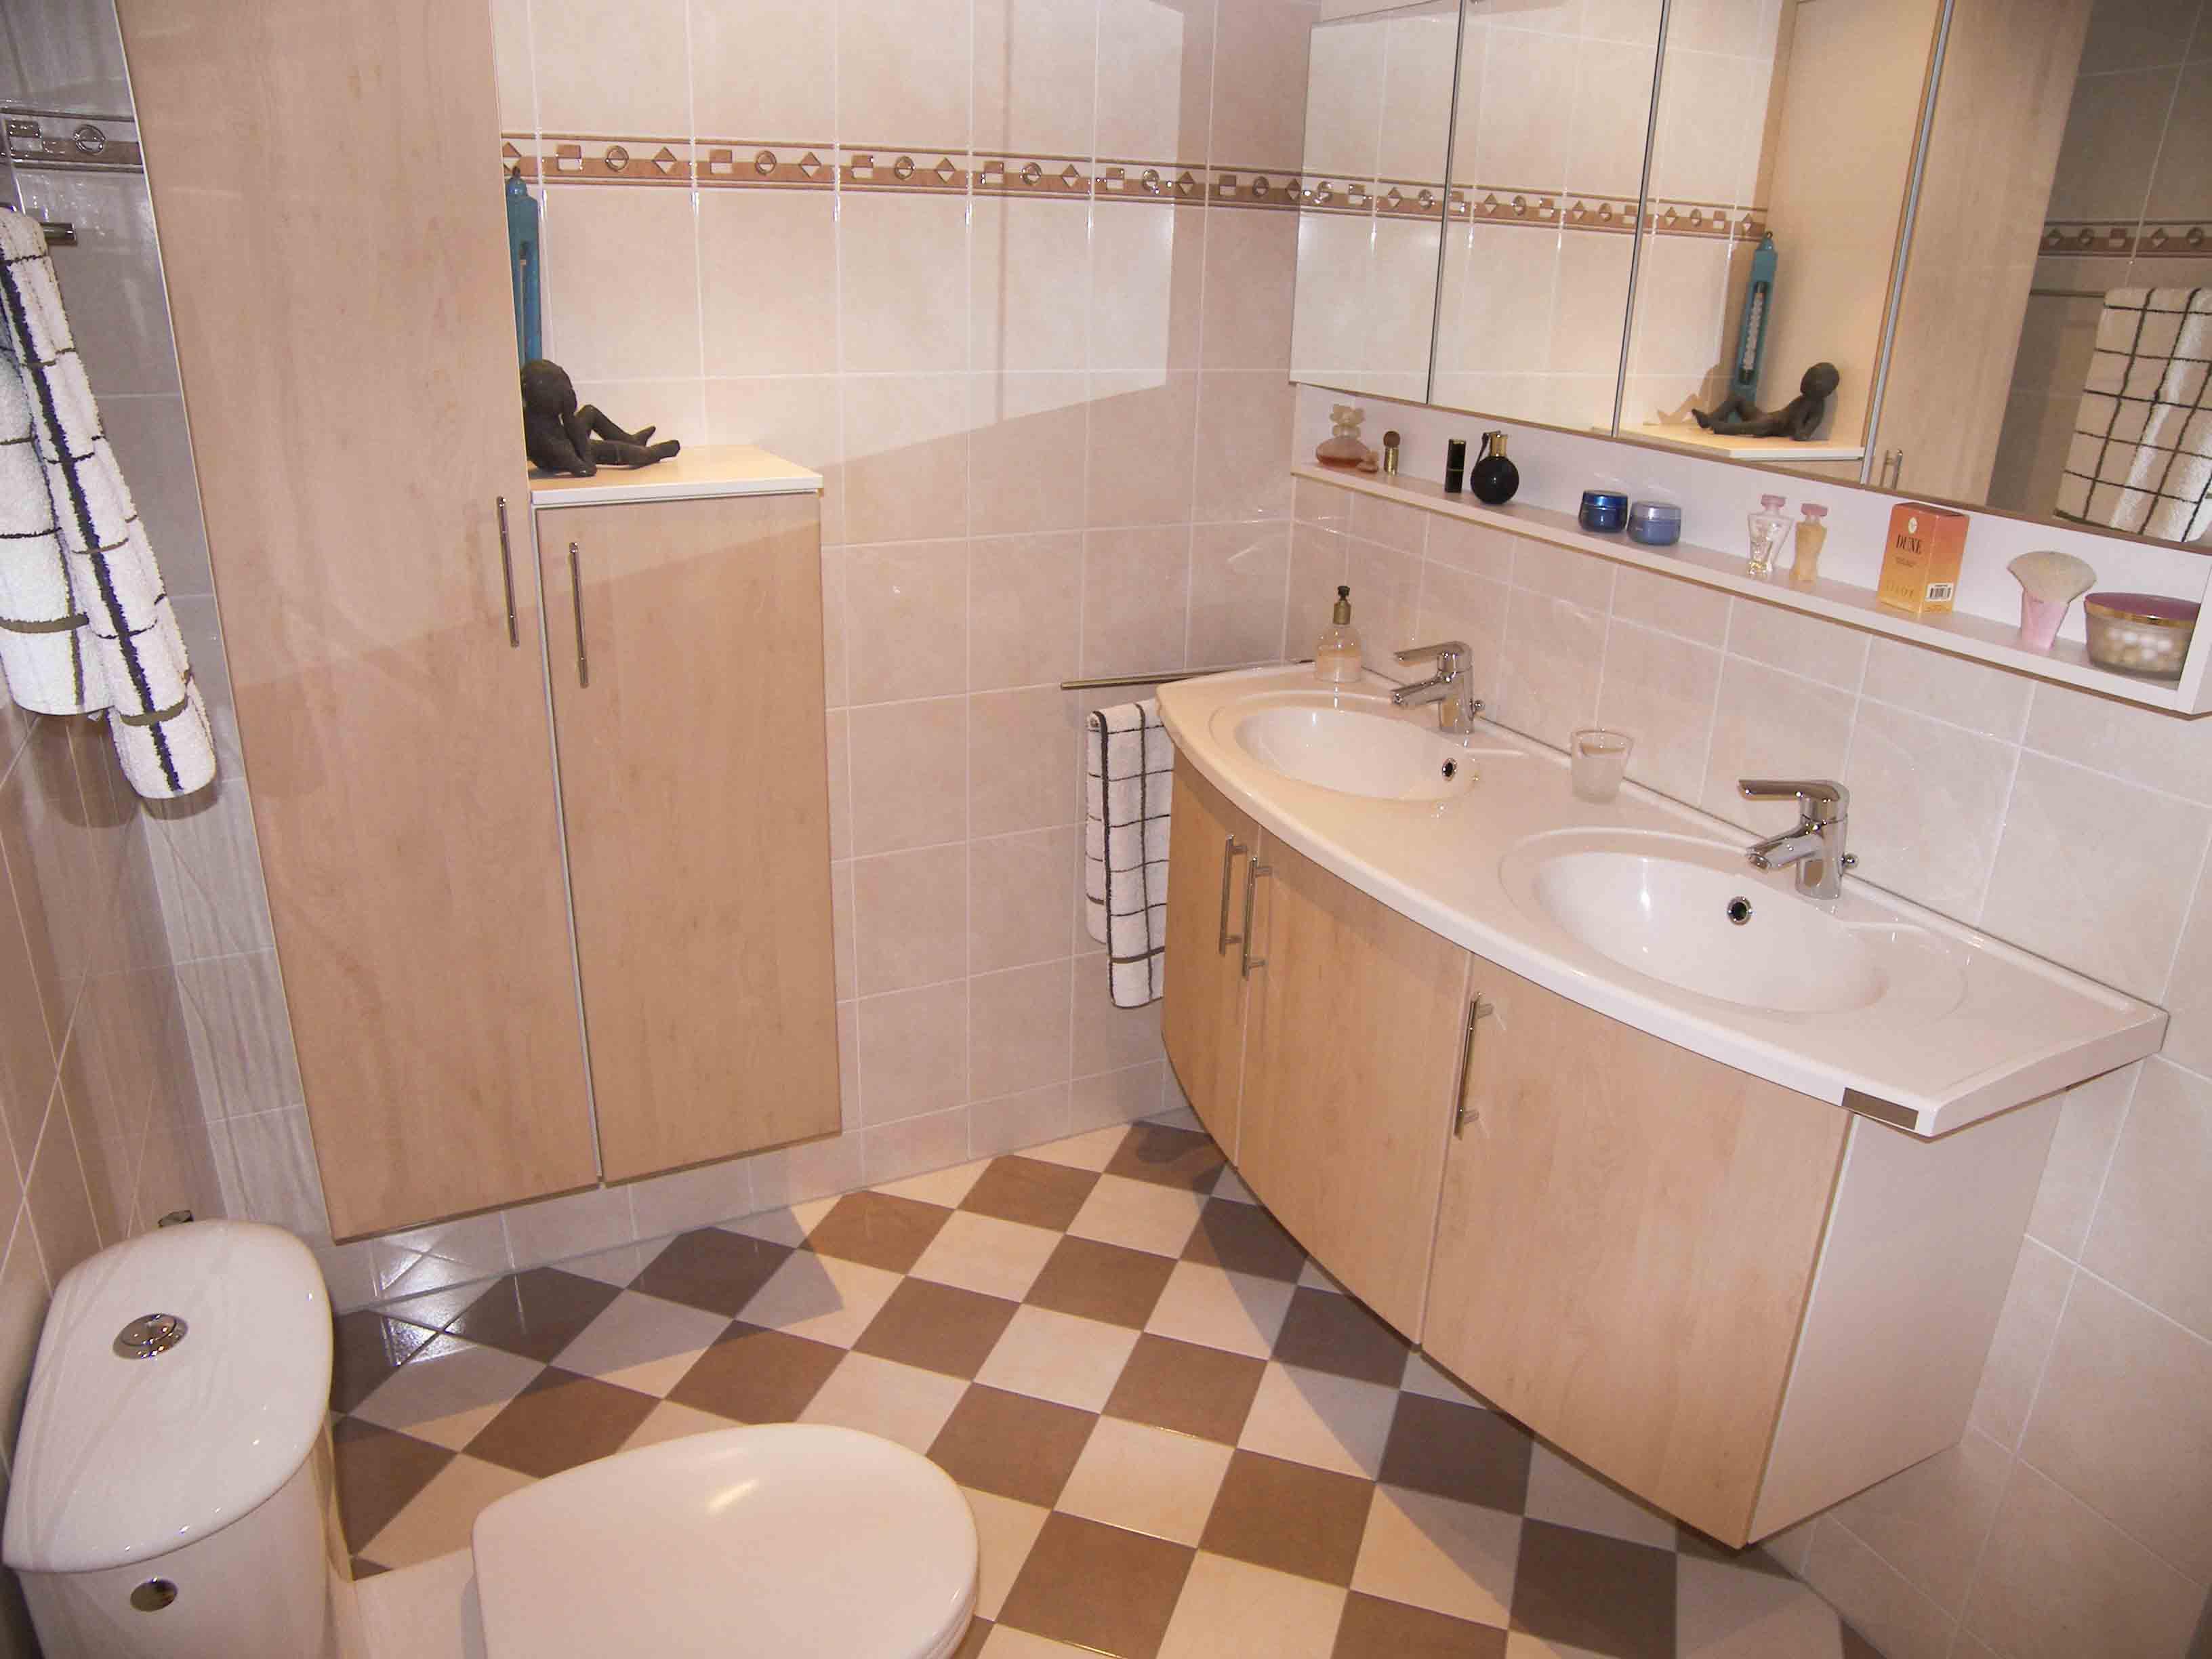 Badkamer Etten Leur : Badkamer te etten leur bouw en visie